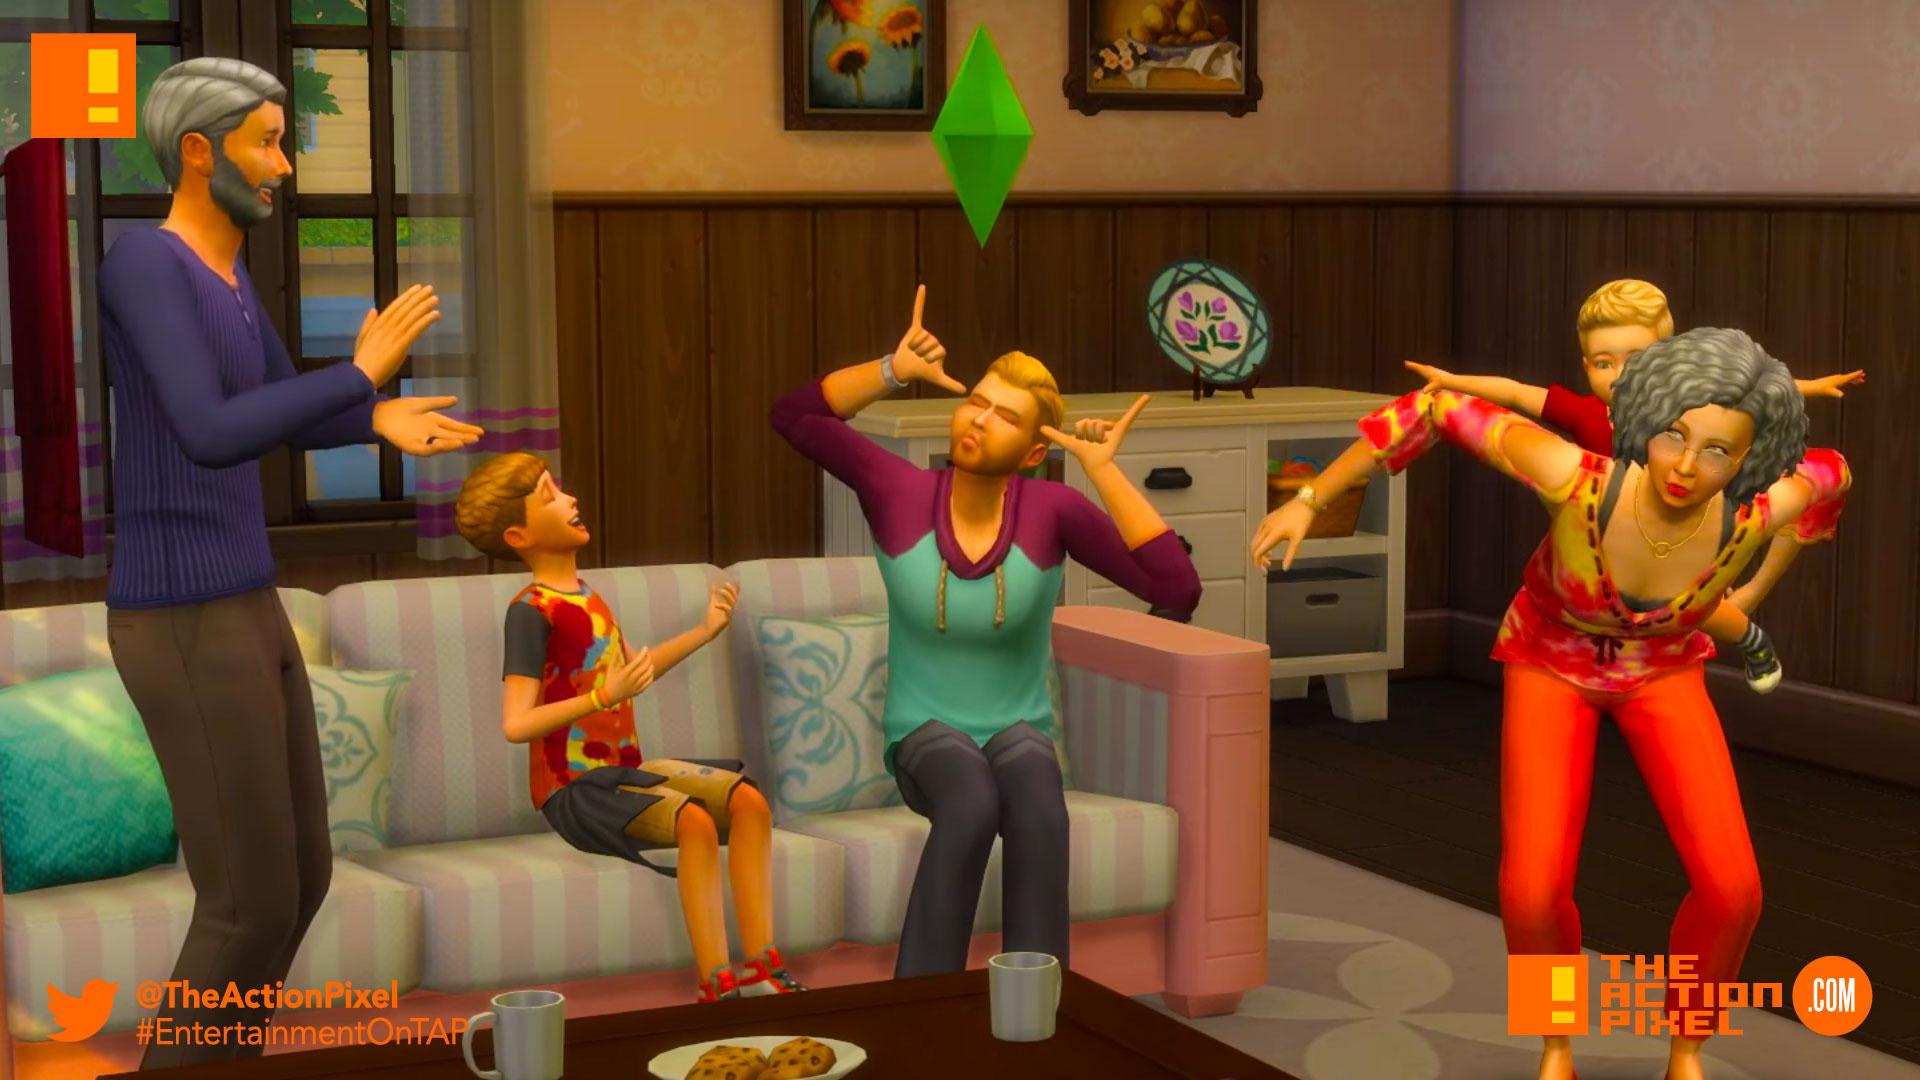 the sims 4 parenthood, parenthood, the sims, the sims 4, trailer, the action pixel, ea, ea games,entertainment on tap,